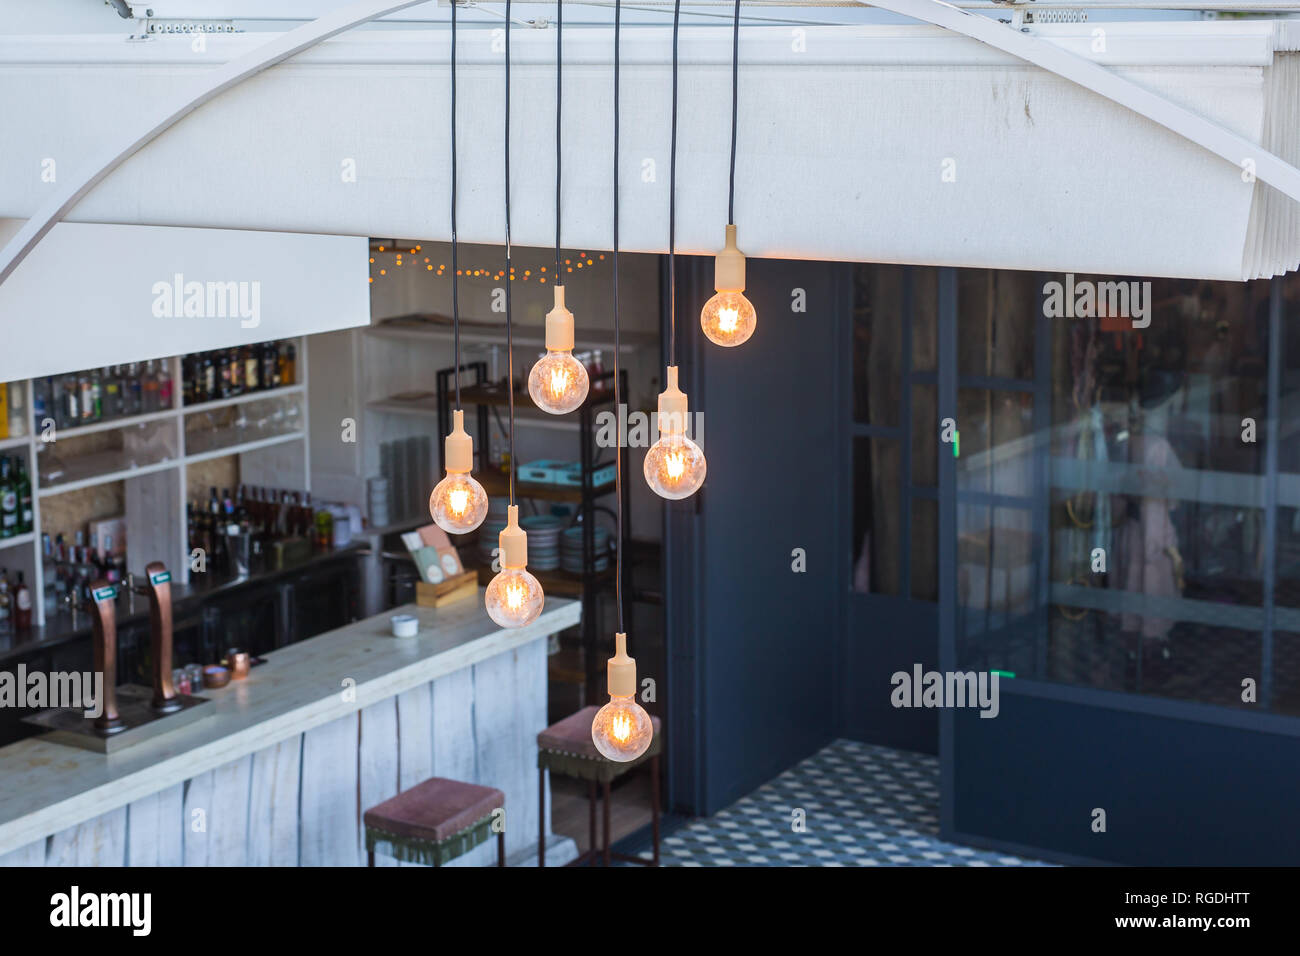 https www alamy com lighting and illumination concept vintage luxury interior lighting decor in cafe vintage light bulb lamps restaurant bar lighting interior design image233868680 html